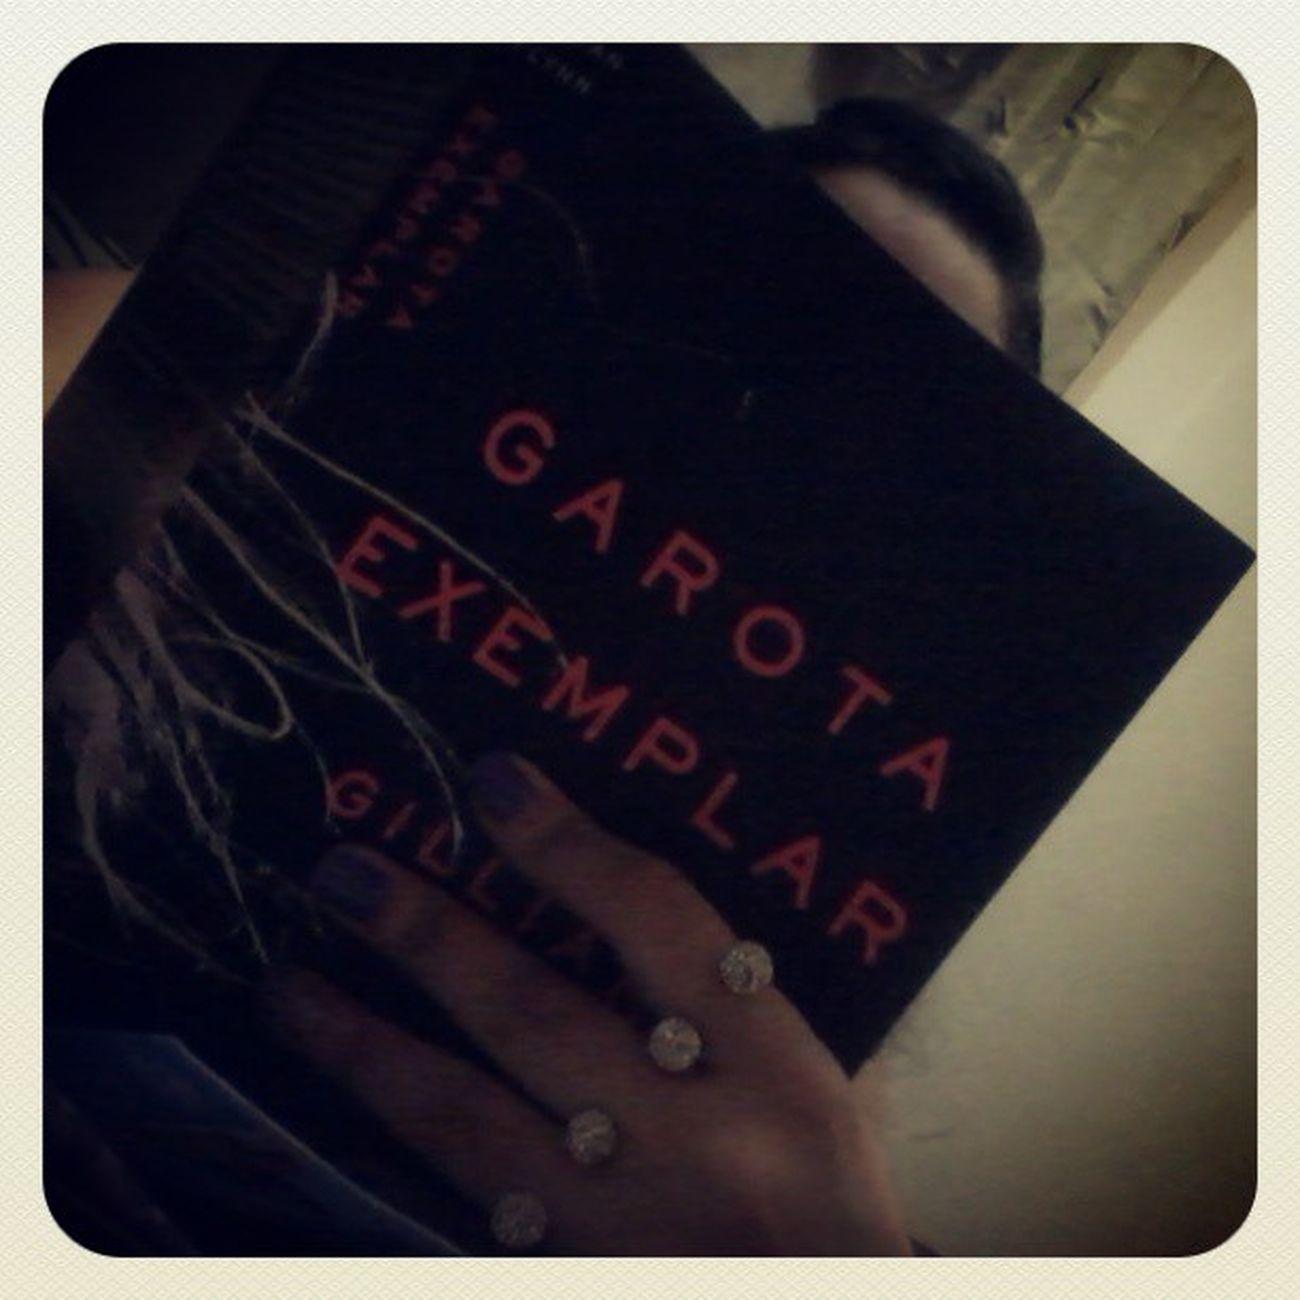 @sofia_galvao obrigada! Noite de leitura. Photo Book Picoftheday Instamood instaphoto instagood instapic instamood vicio love